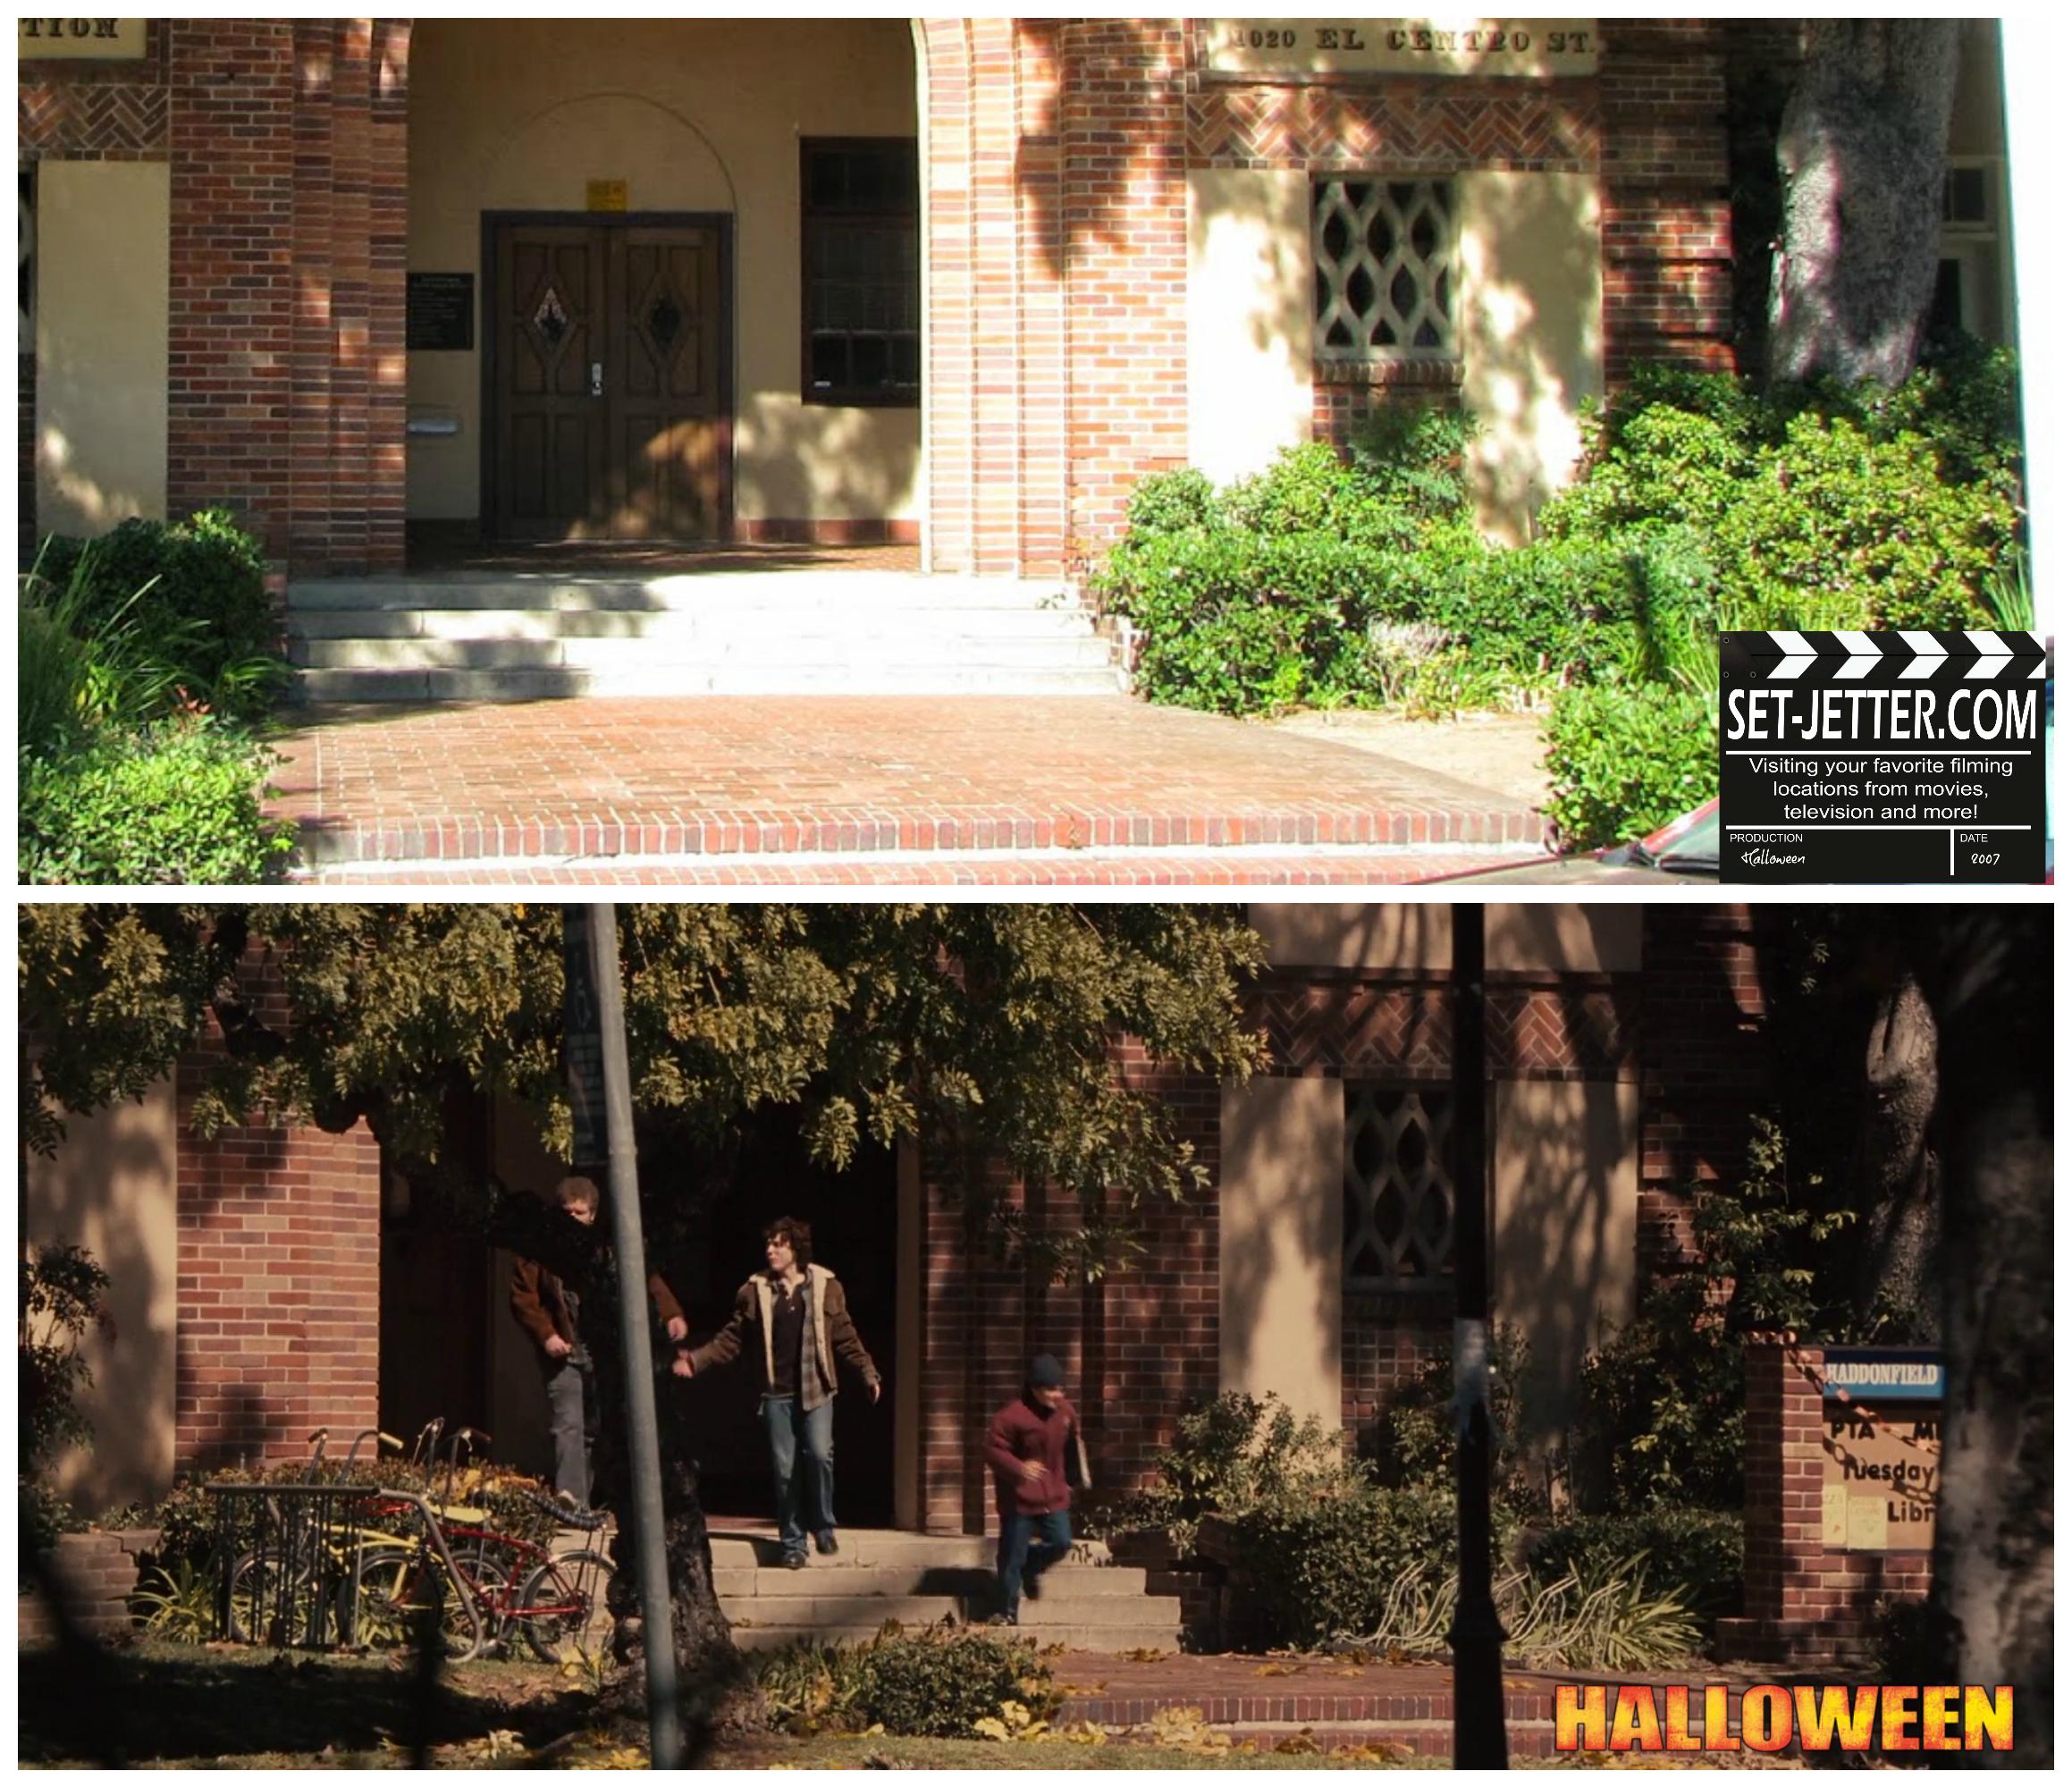 Halloween 2007 comparison 23.jpg